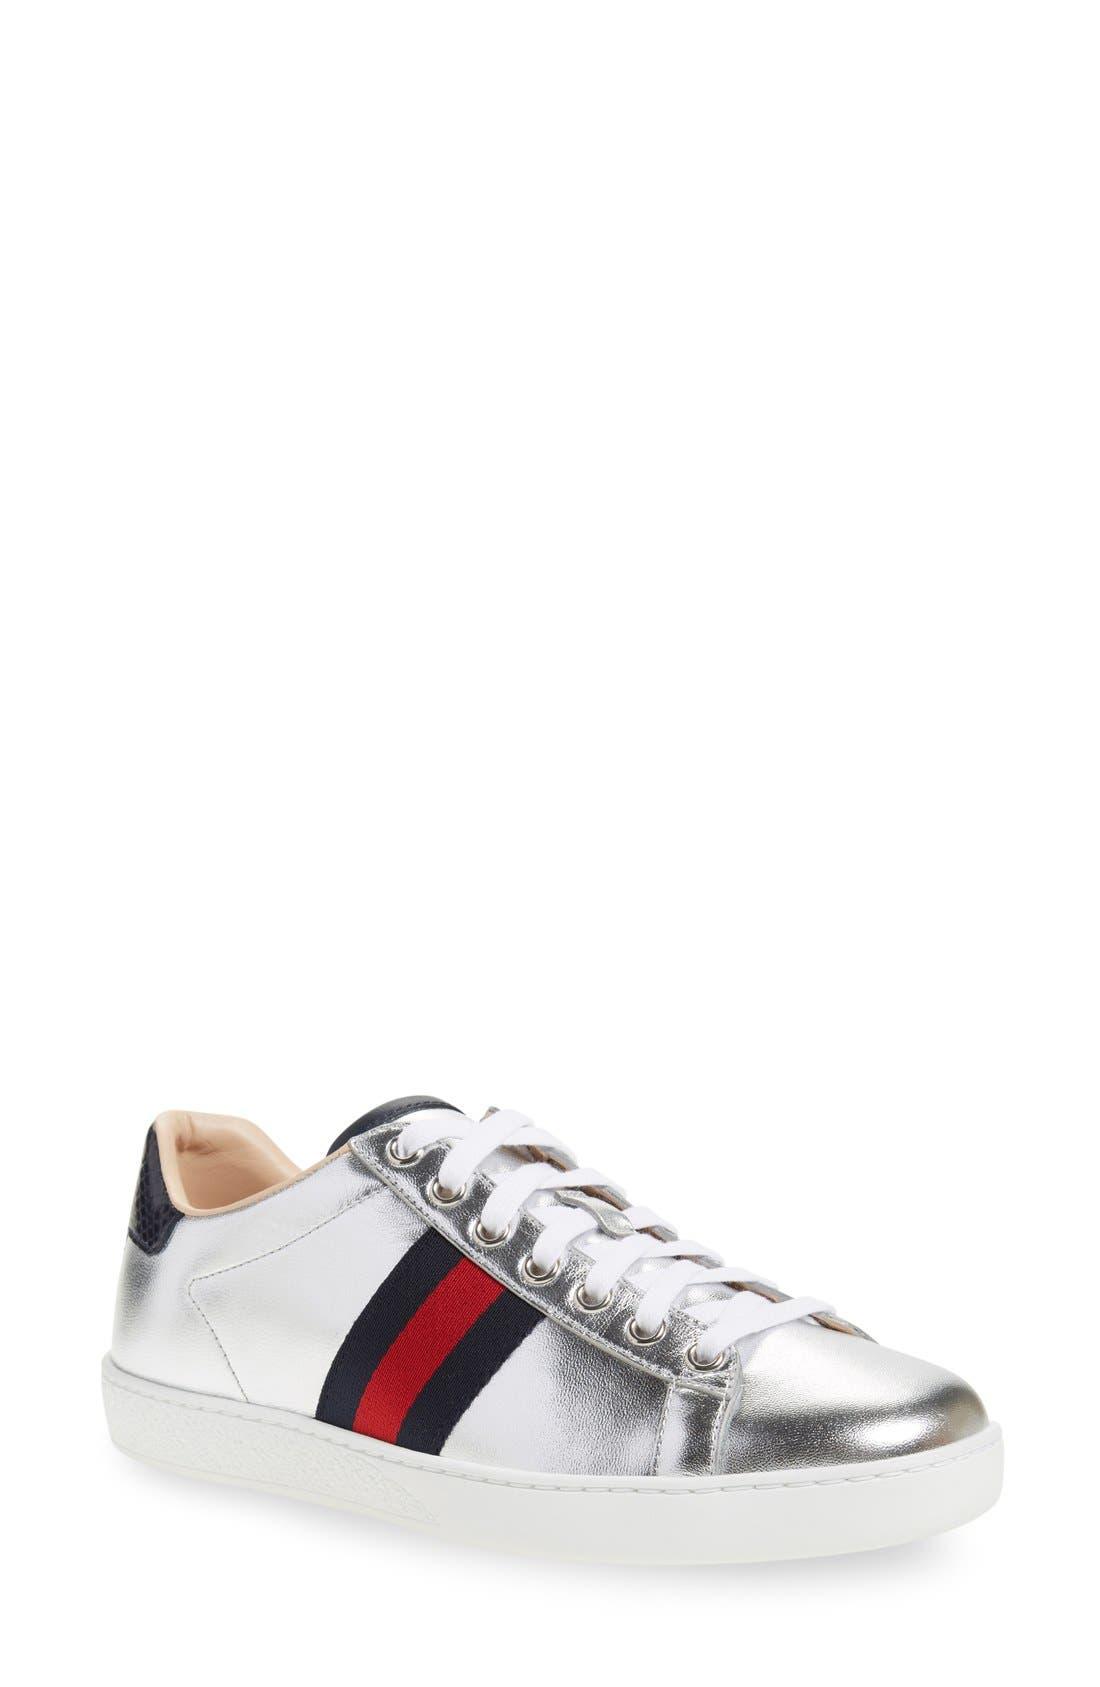 Alternate Image 1 Selected - Gucci 'New Ace' Metallic Low Top Sneaker (Women)